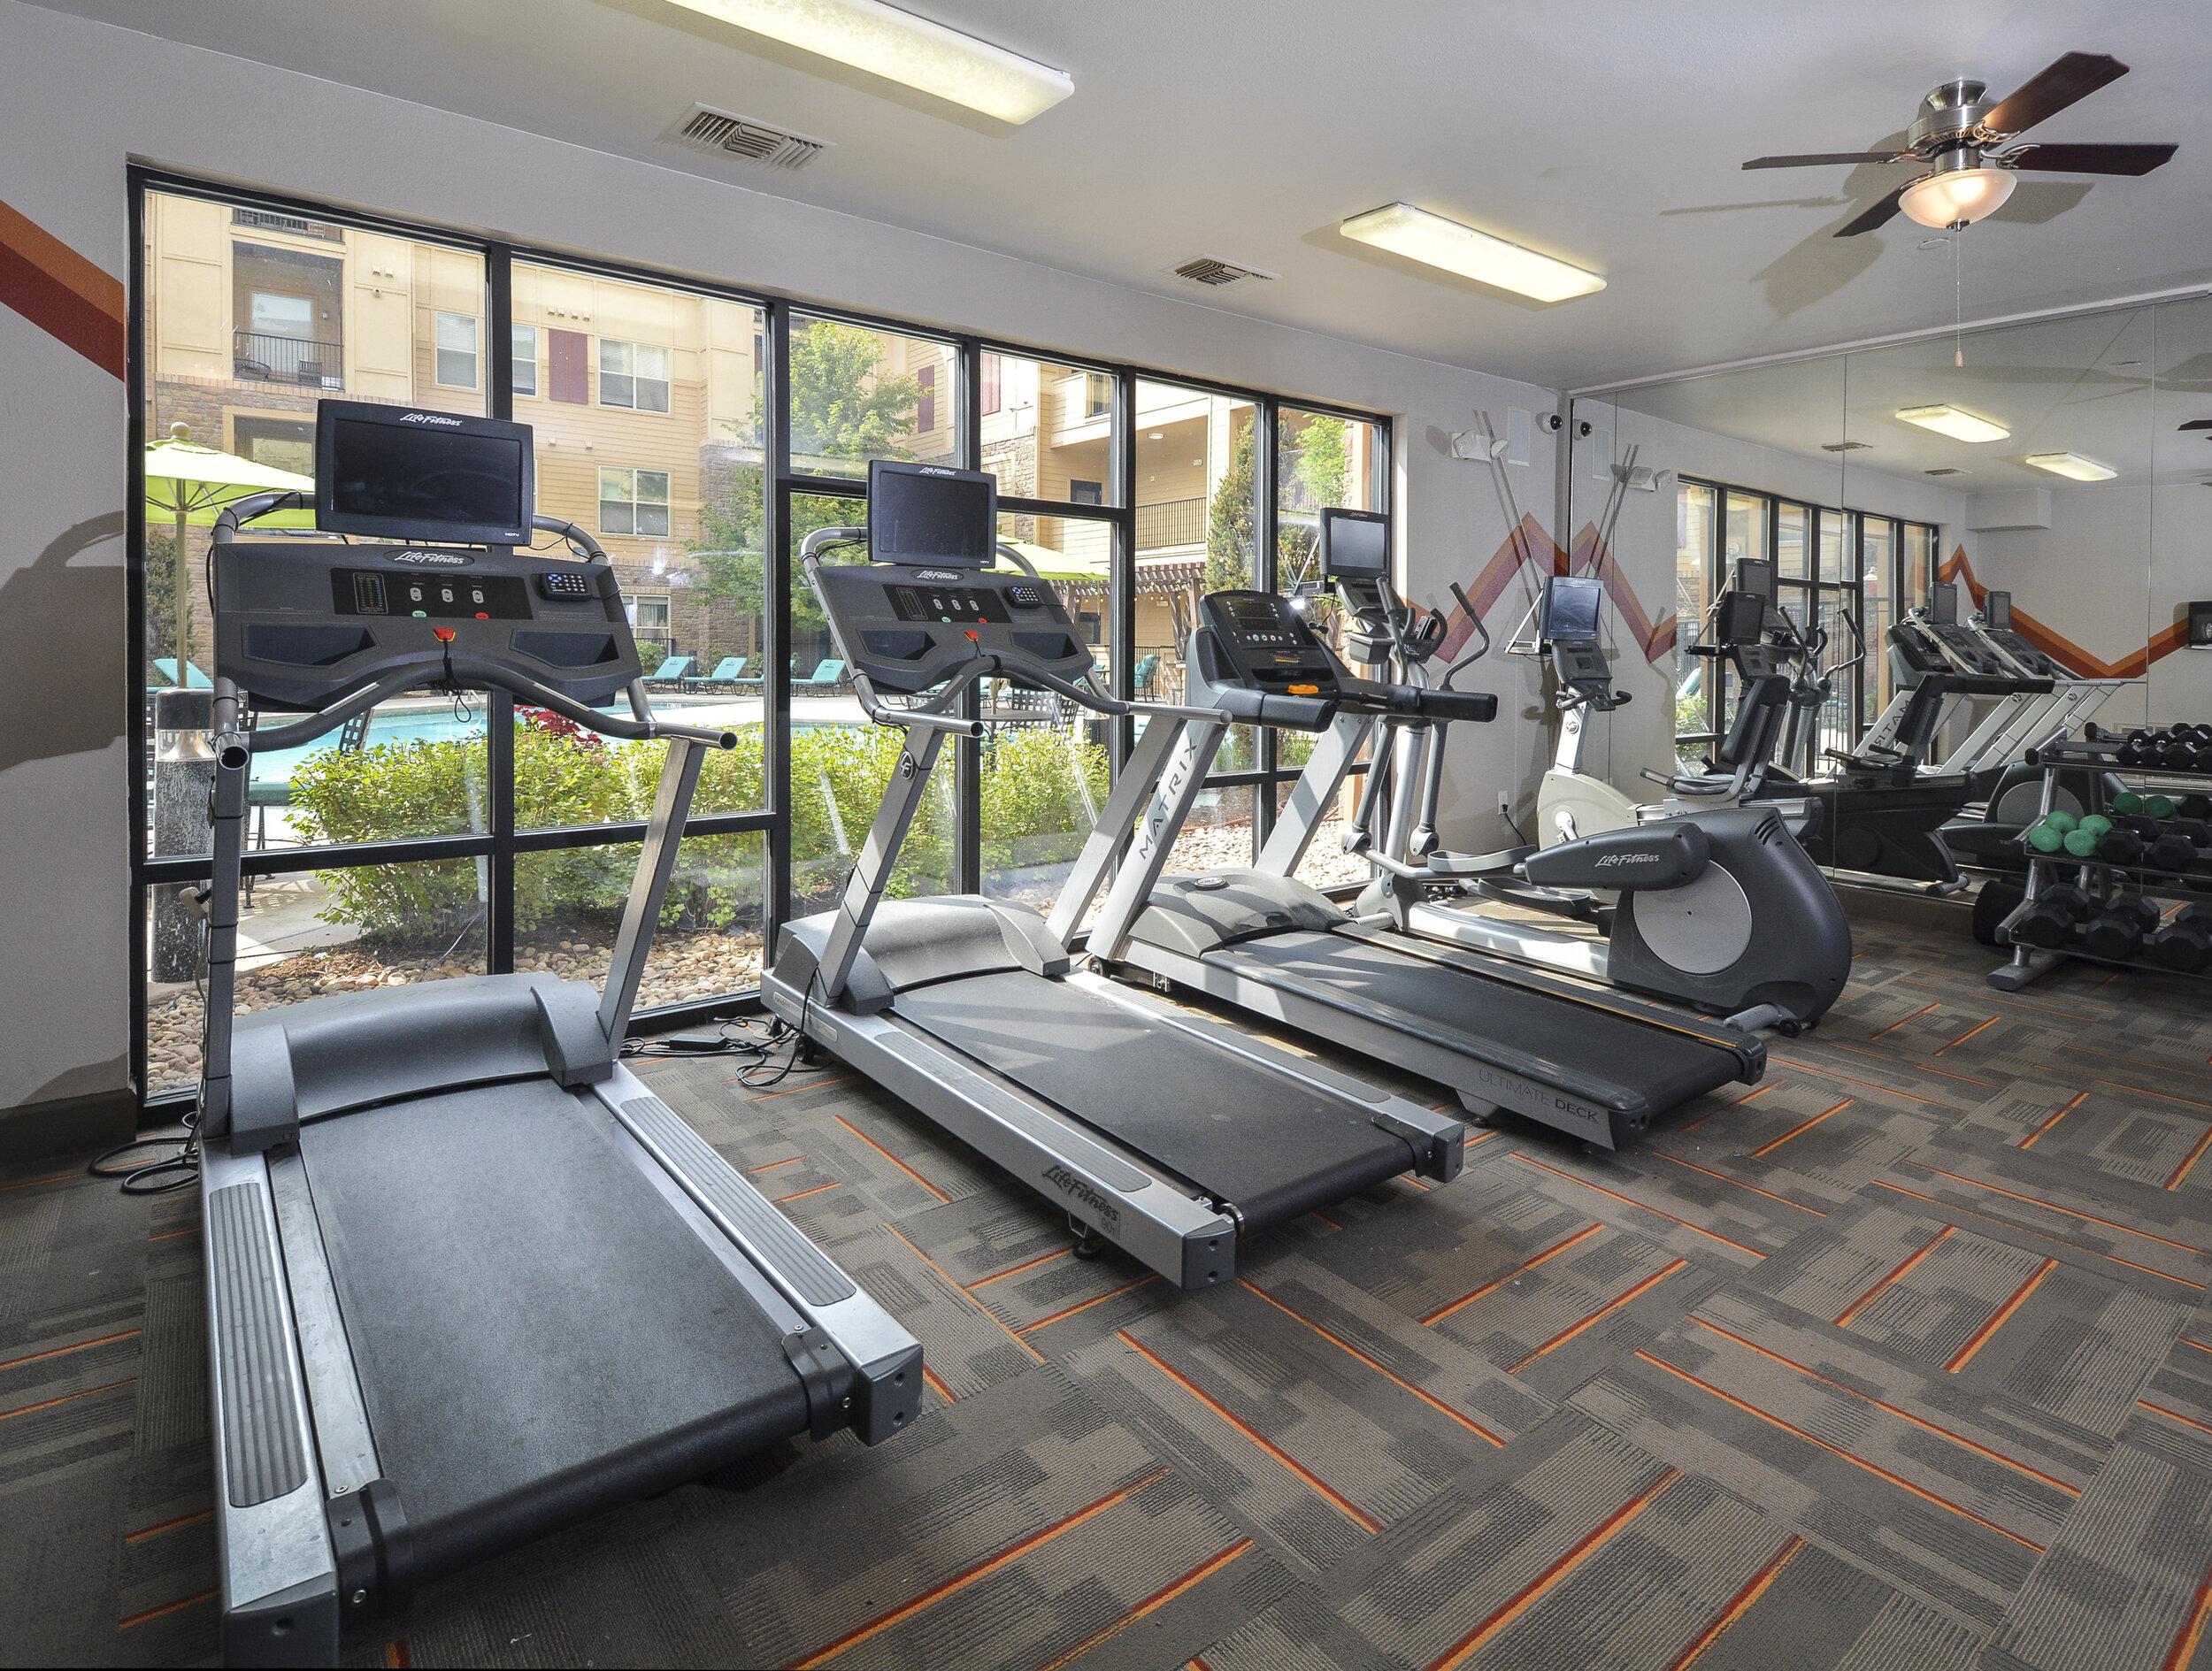 15-24-Hour State-of-the-Art Fitness Center.jpg